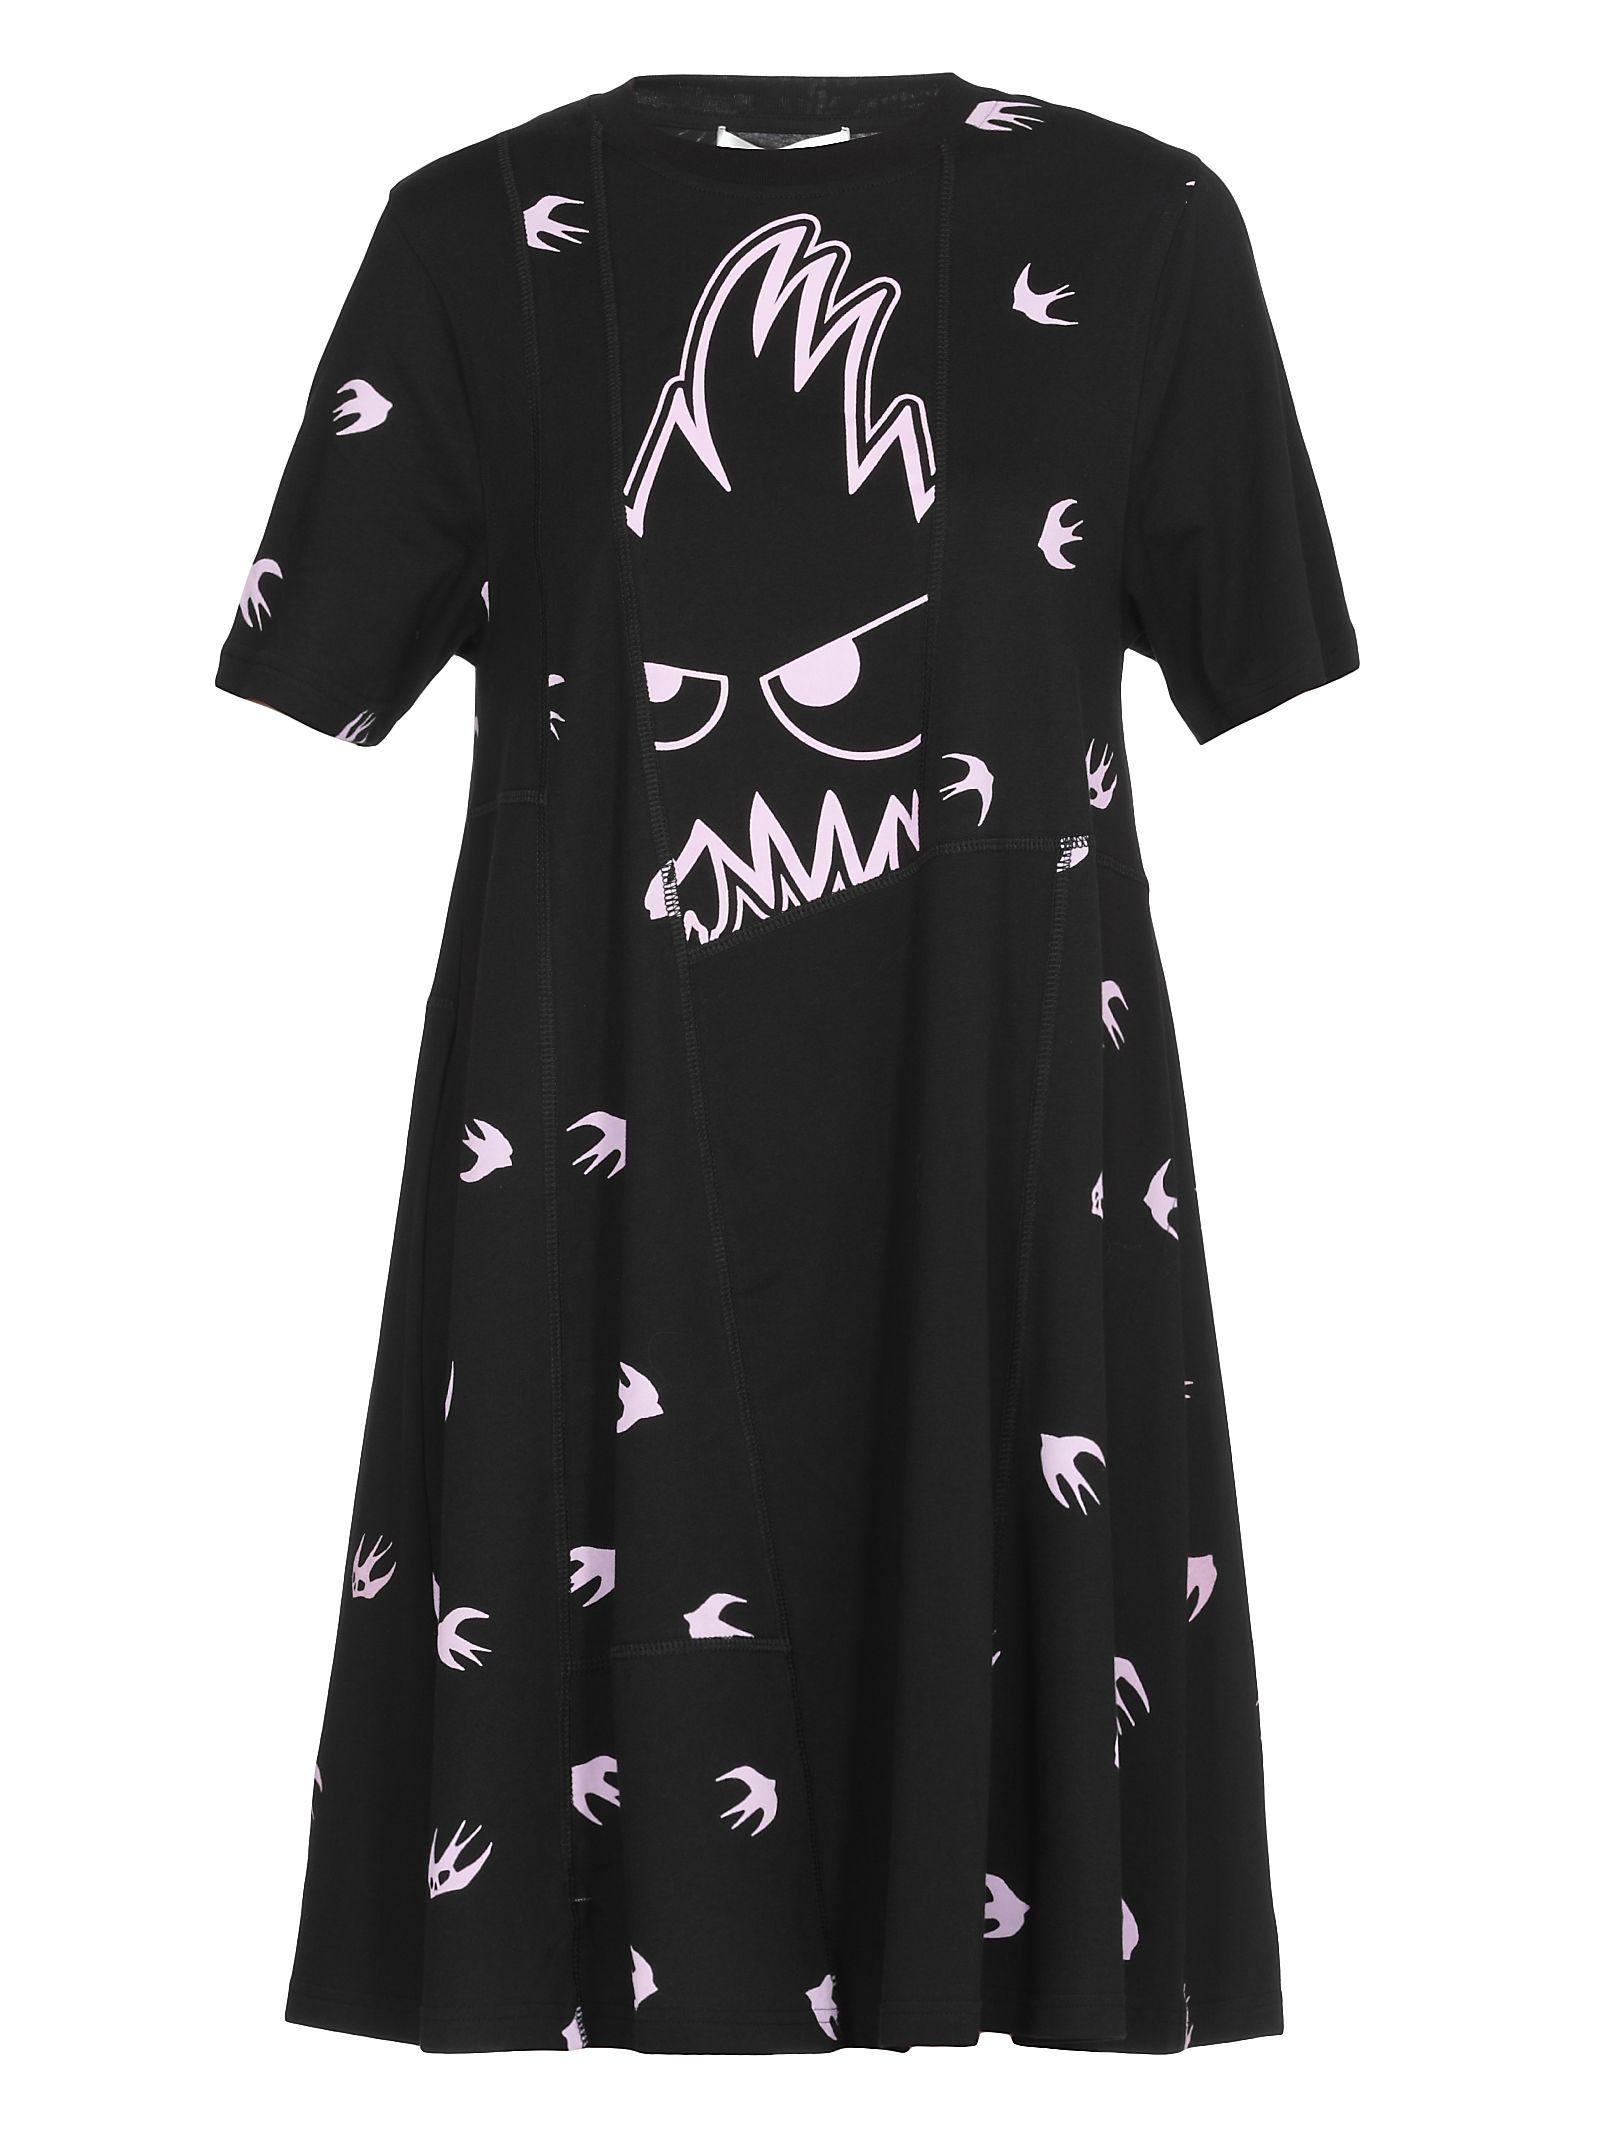 Mcq Alexander Mcqueen 'Swallow Monster' Dress in Black/Pink